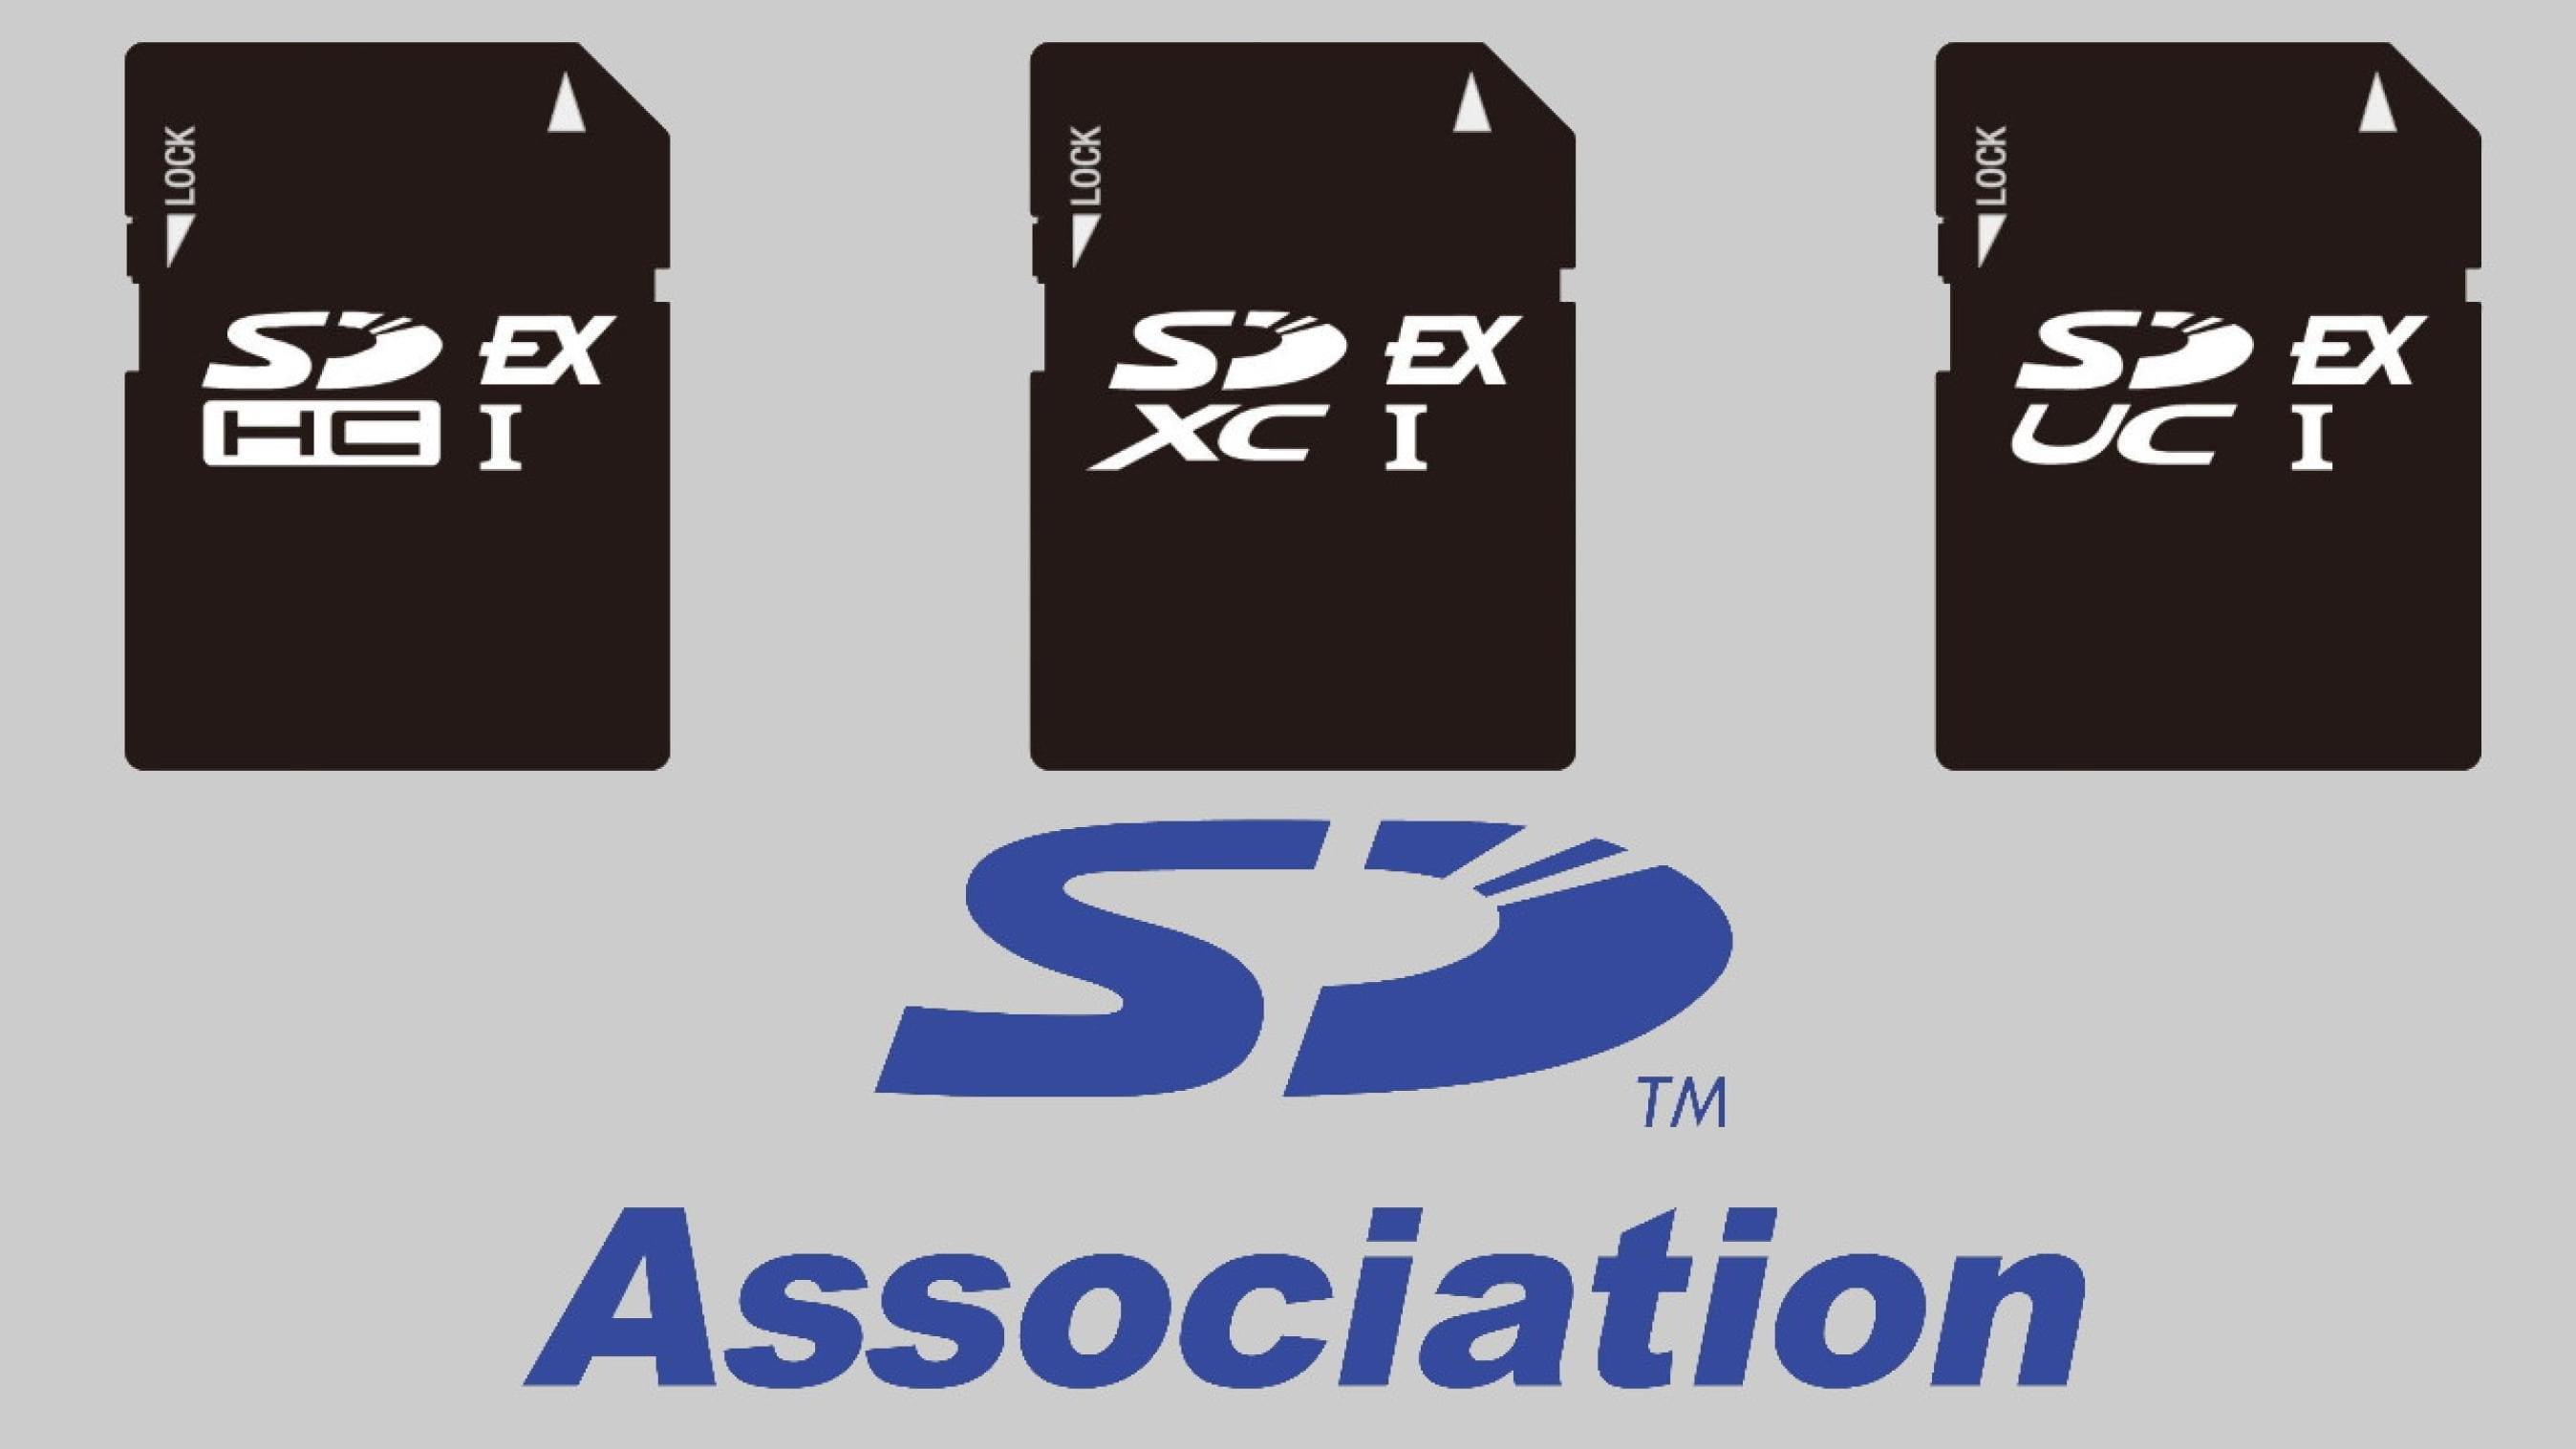 SD Association تعلن عن مواصفات المعايير الجديدة لبطاقة الذاكرة SD Express